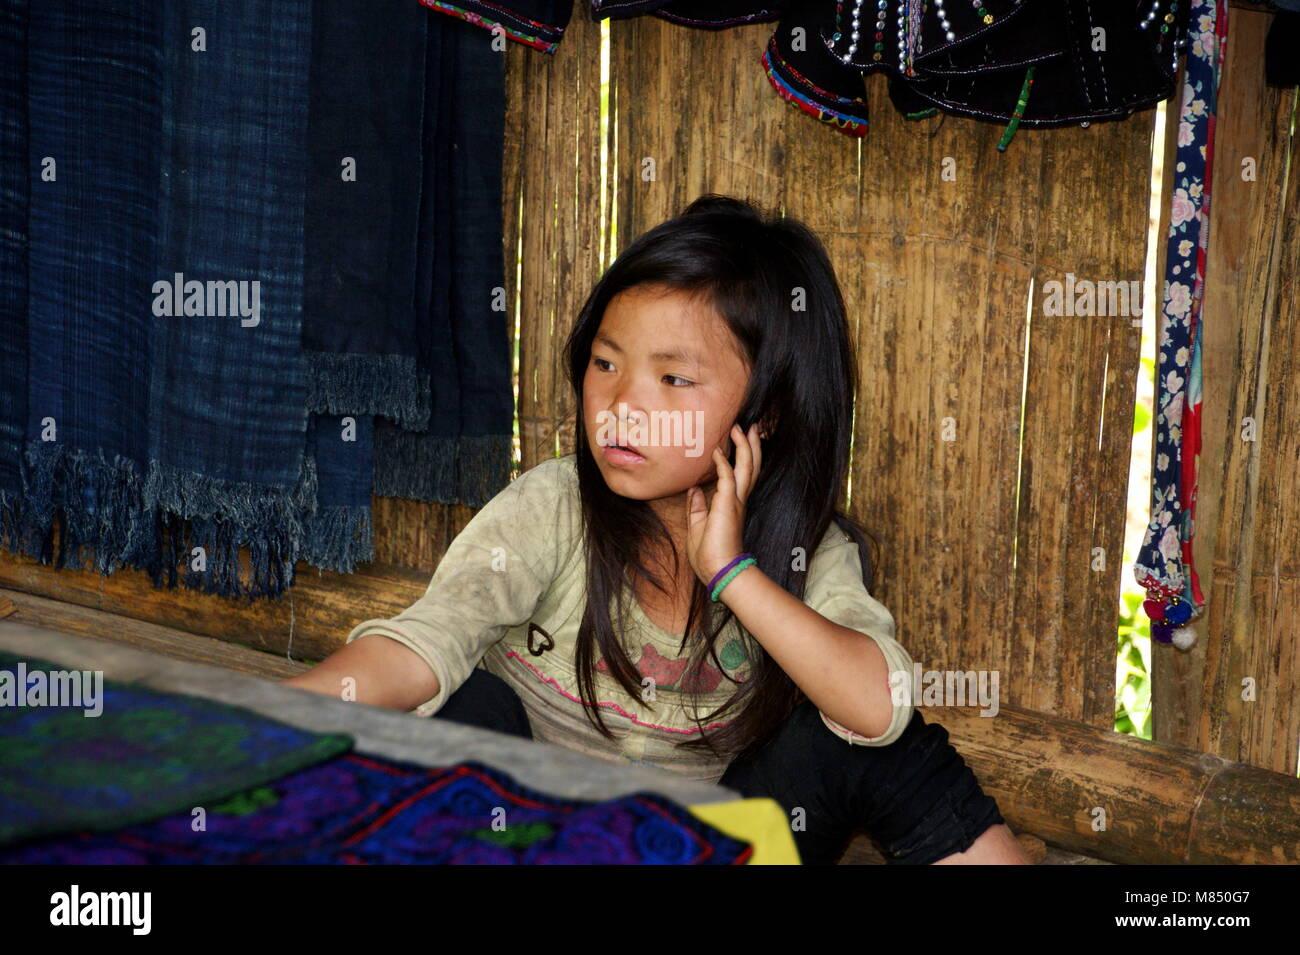 A beautiful Vietnamese girl, a representative of a small ethnic group. National minorities in Sapa. Sapa, Vietnam, Stock Photo